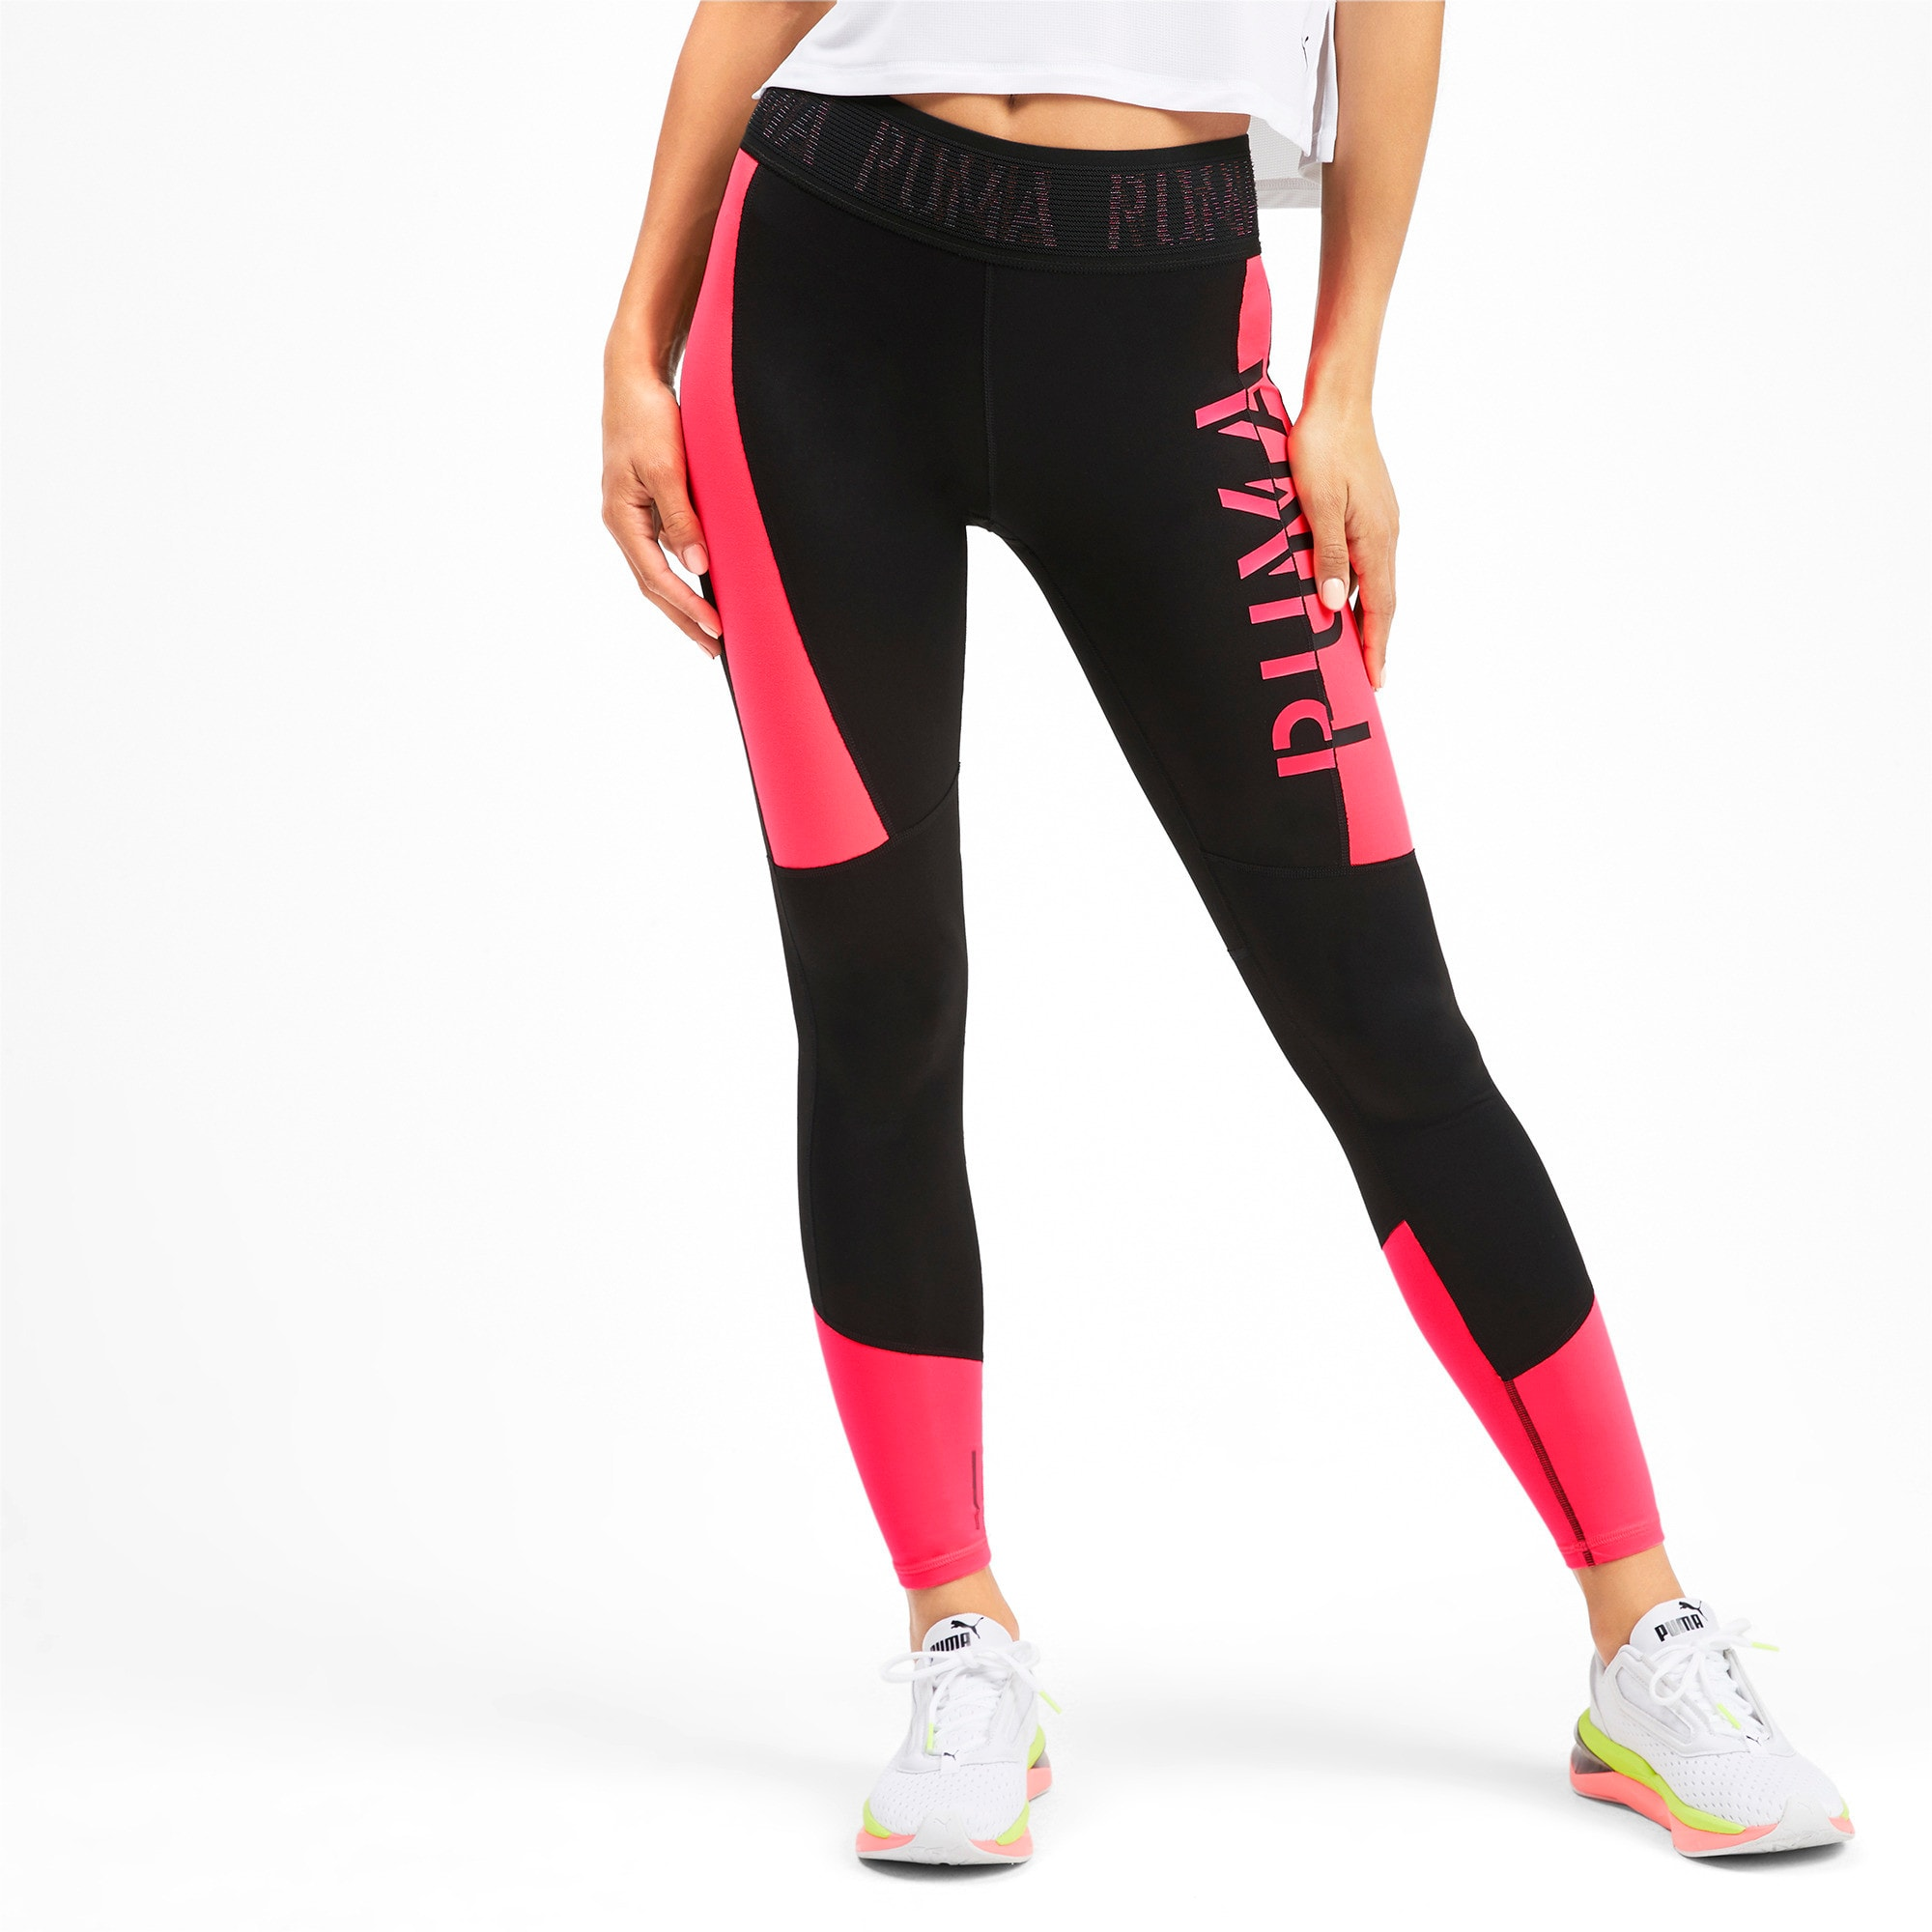 Thumbnail 1 of Logo Women's 7/8 Leggings, Puma Black-Pink Alert, medium